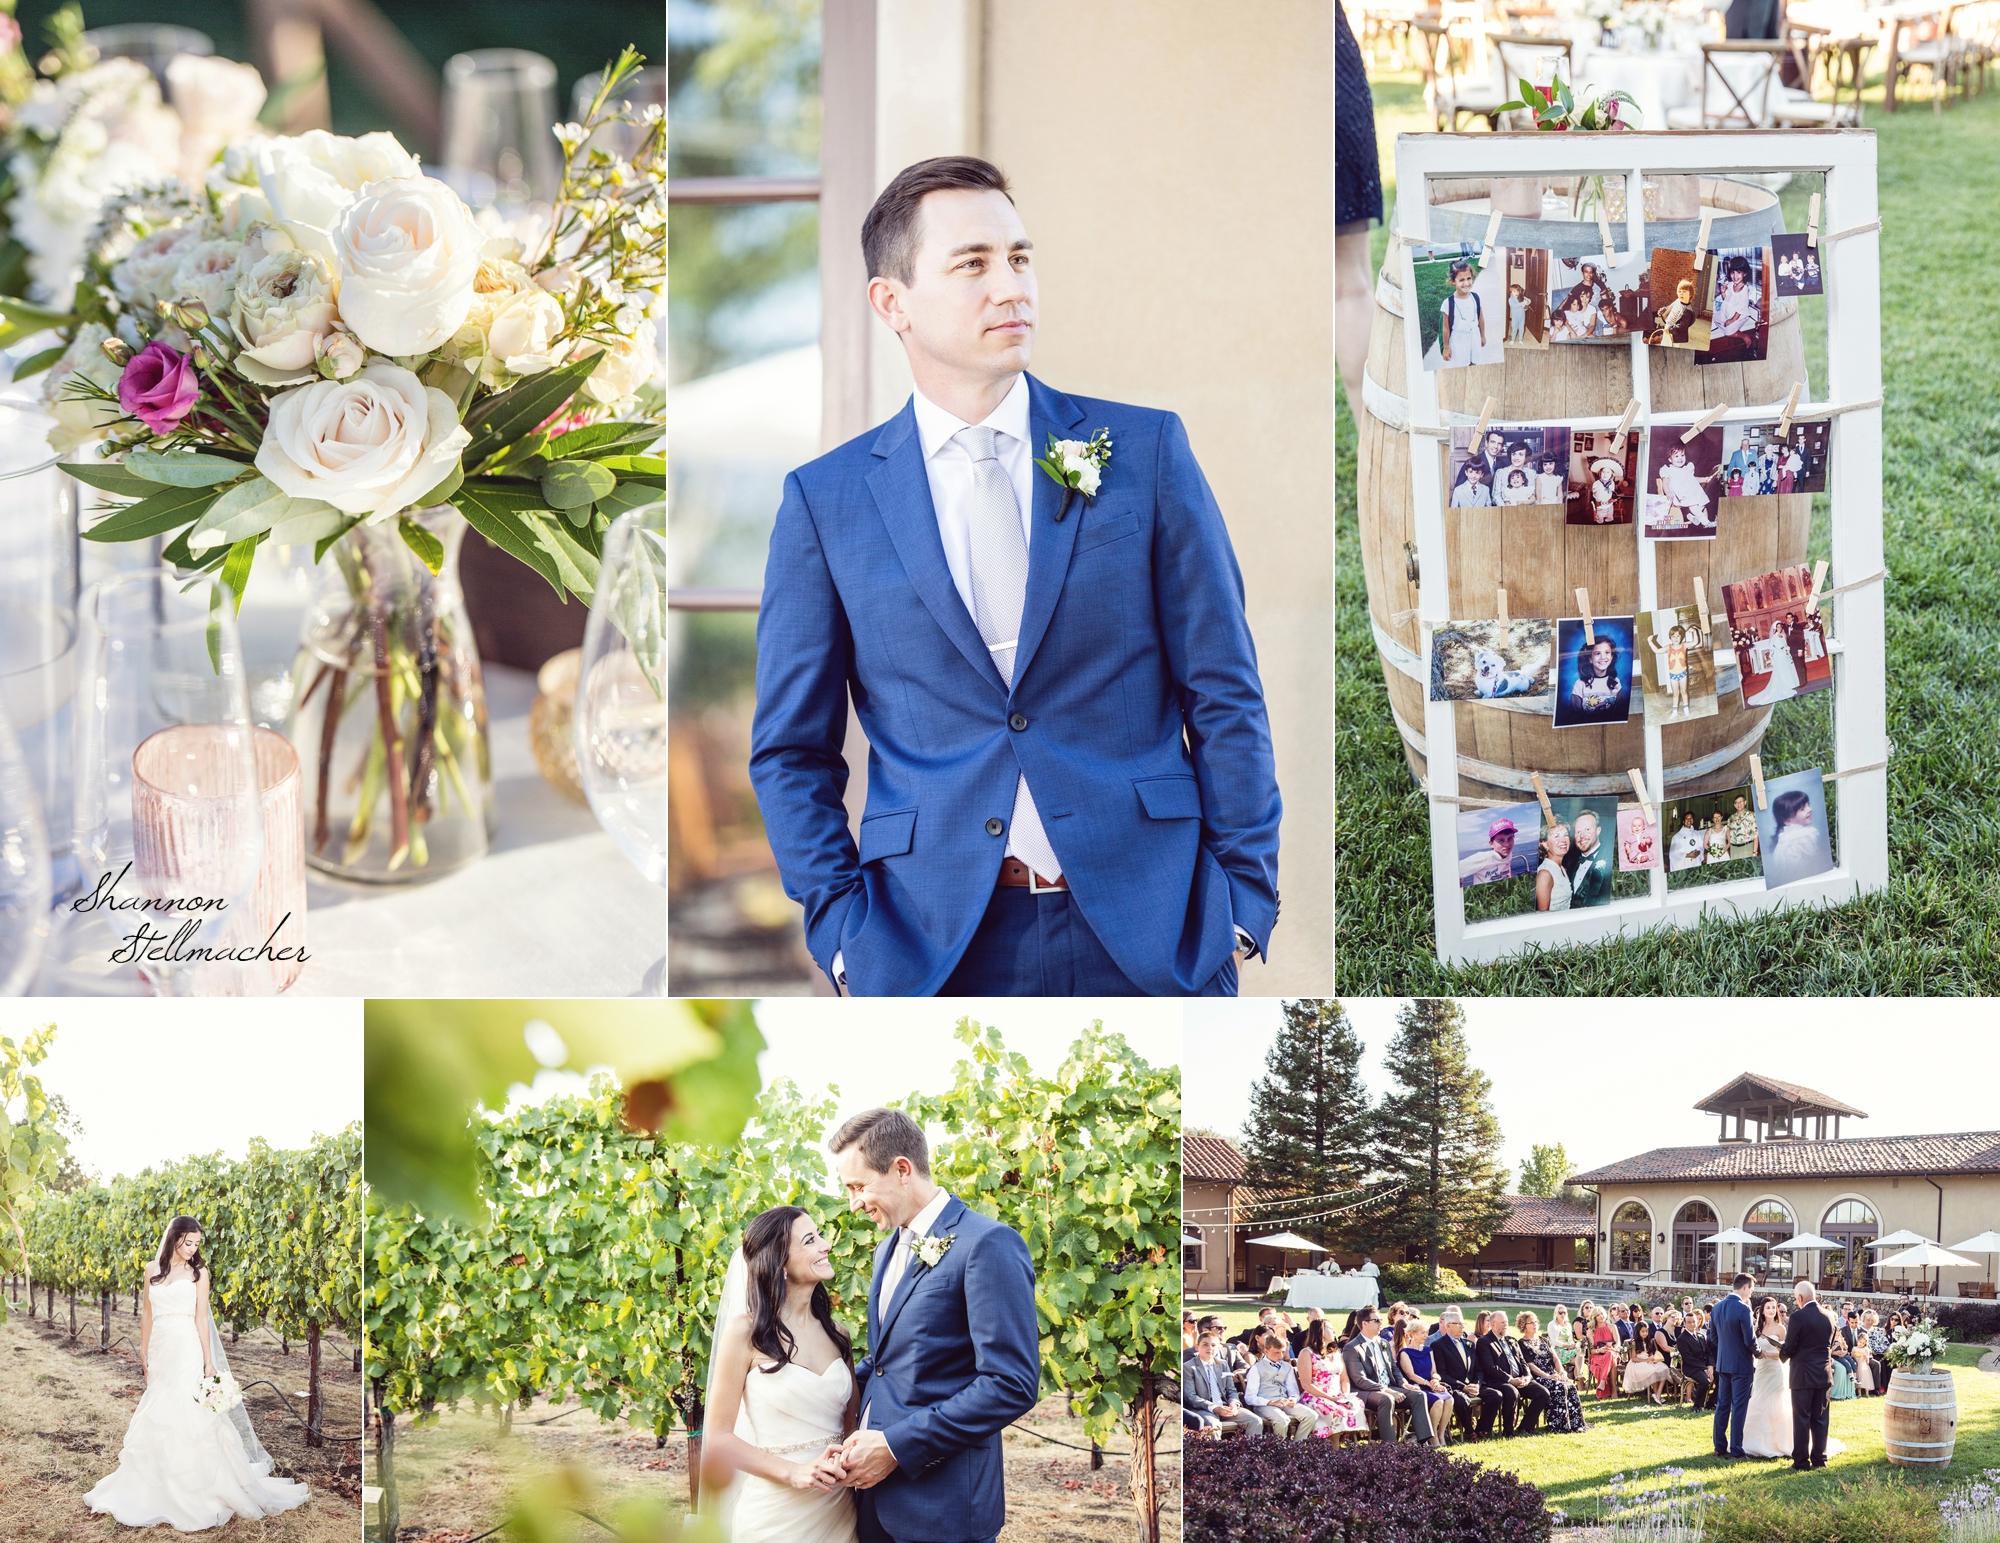 St. Francis Winery Wedding1 3.jpg